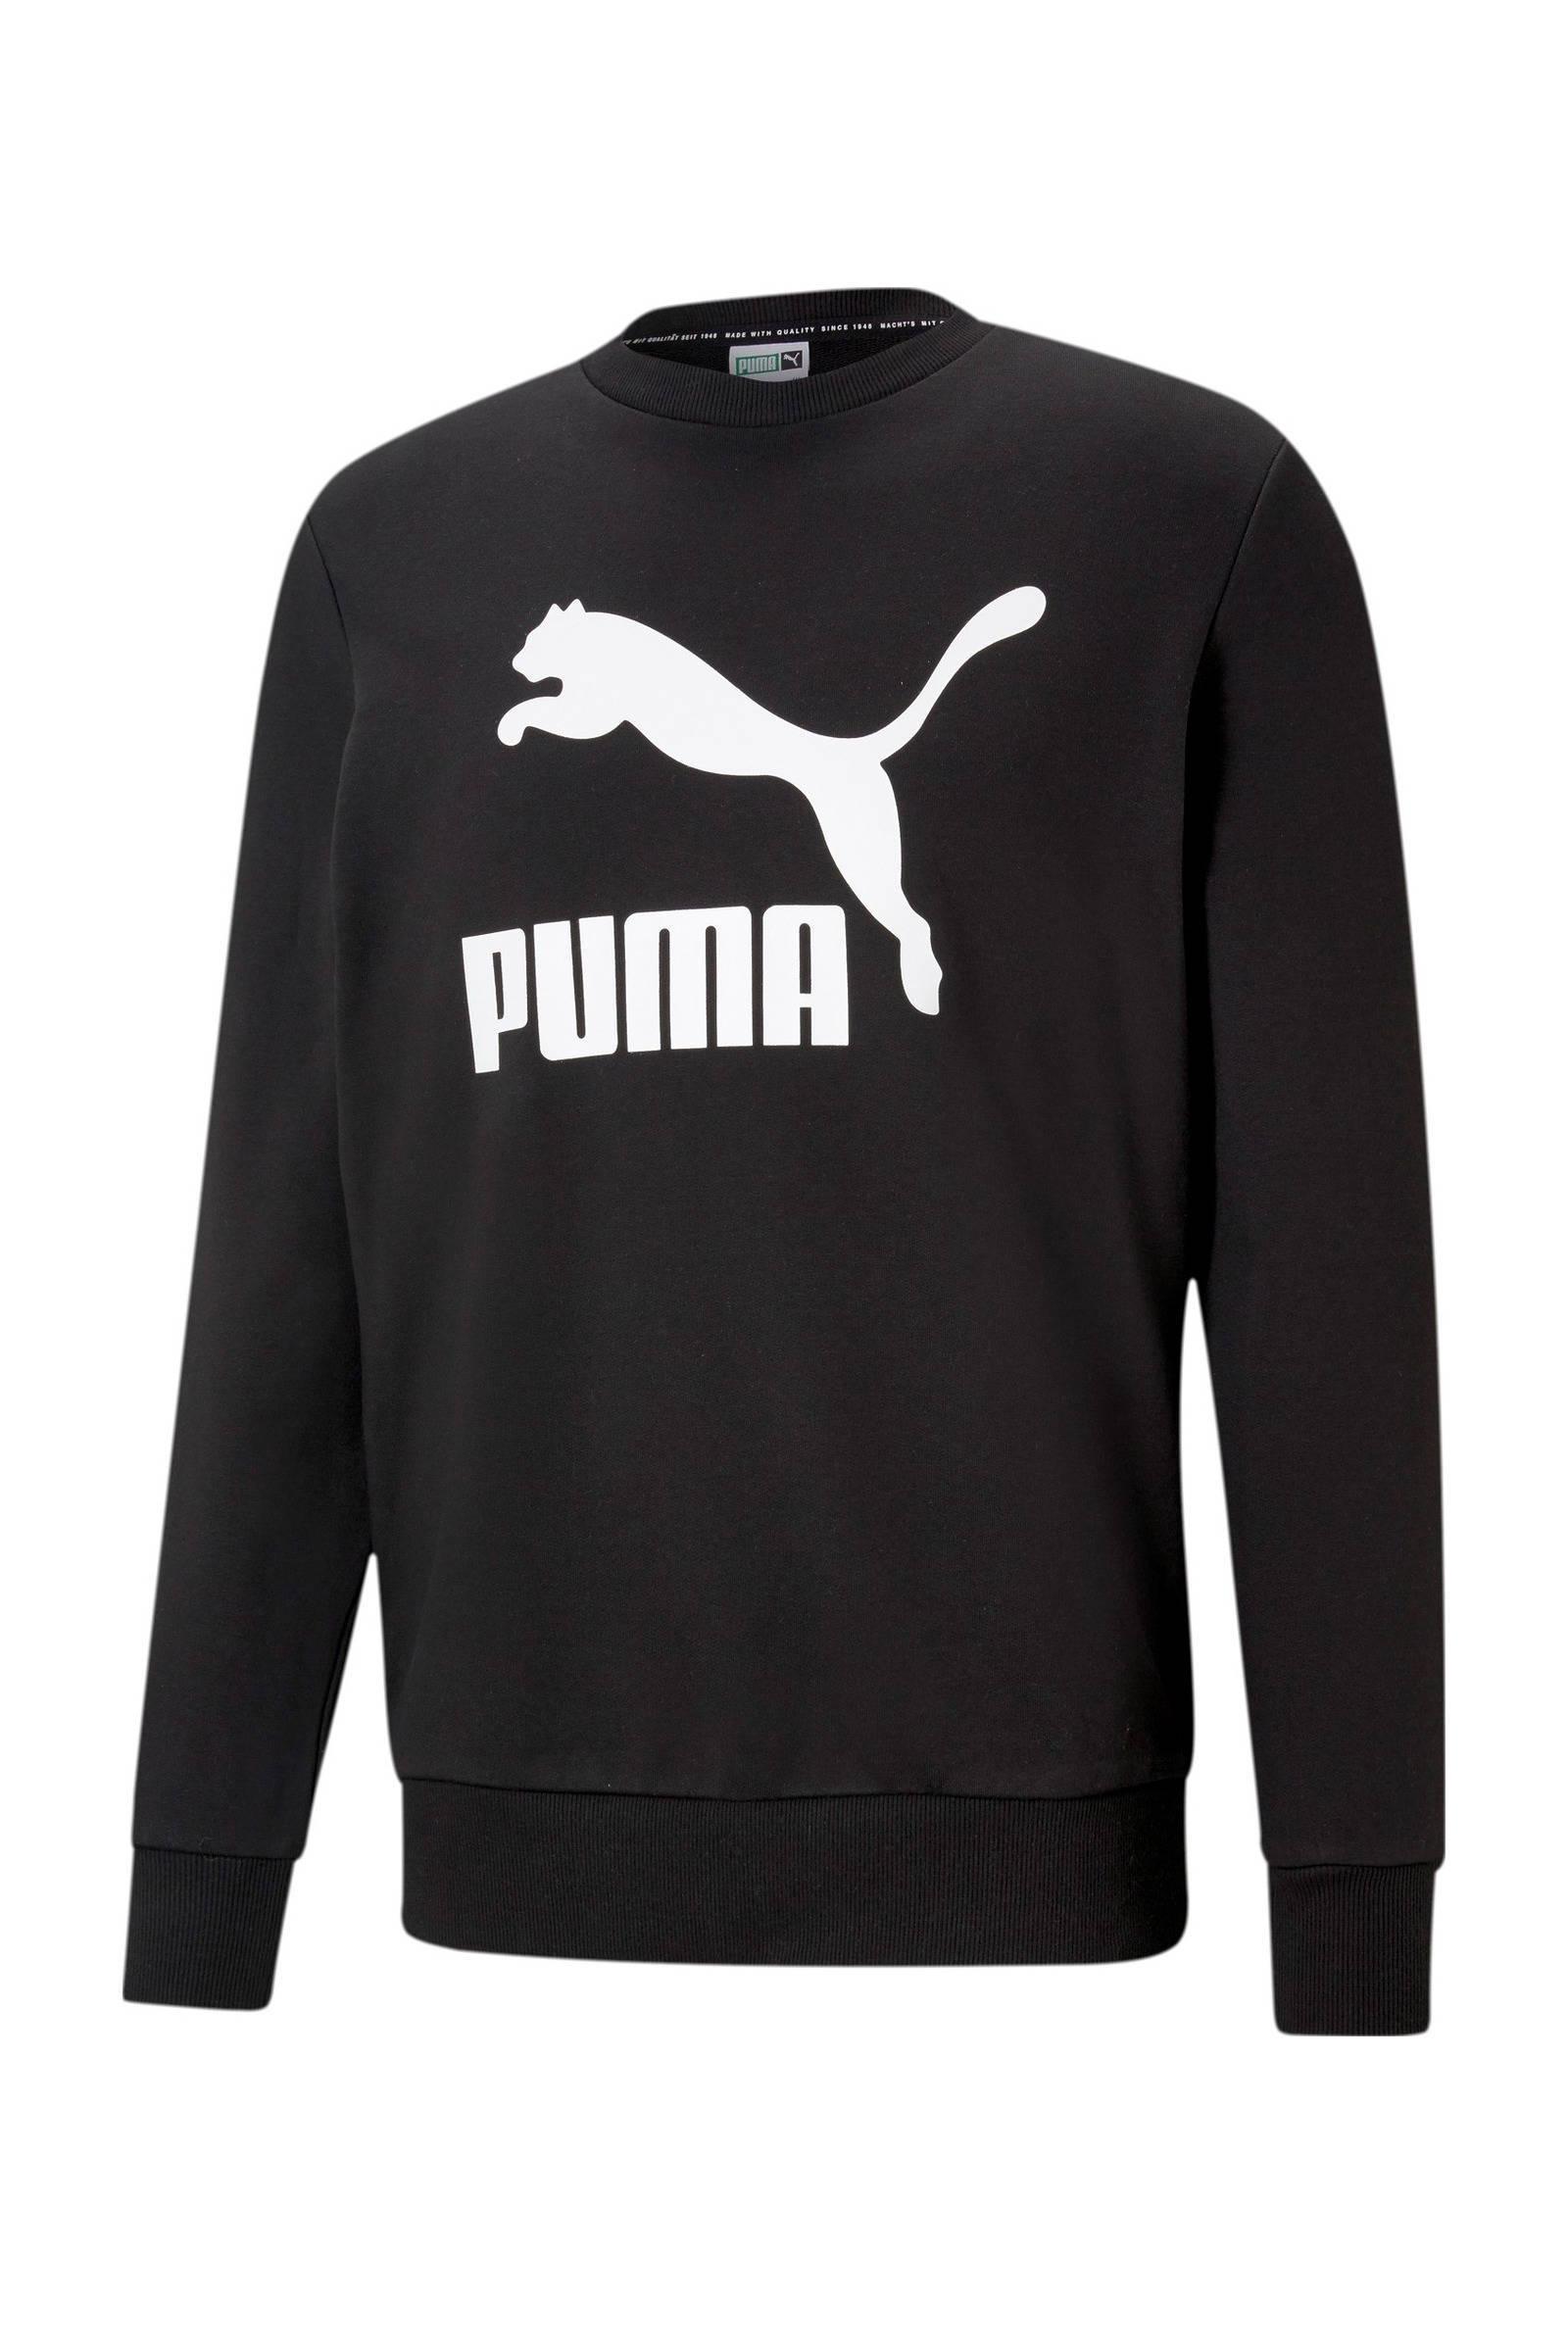 Puma sweater zwart/wit online kopen